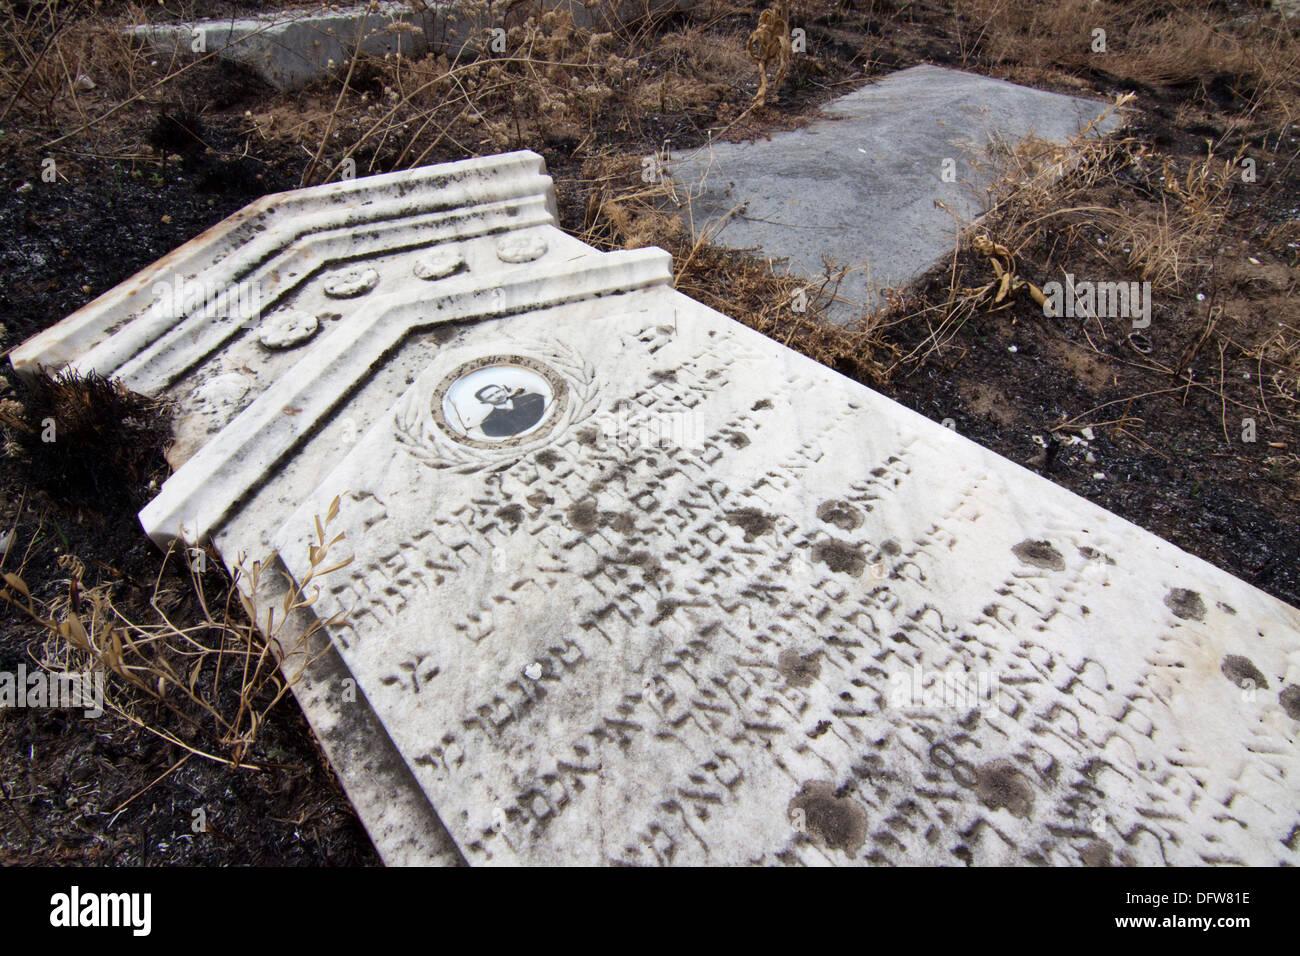 Headstone with inscription in Hebrew, abandoned Jewish cemetery in Vidin, northwestern Bulgaria - Stock Image